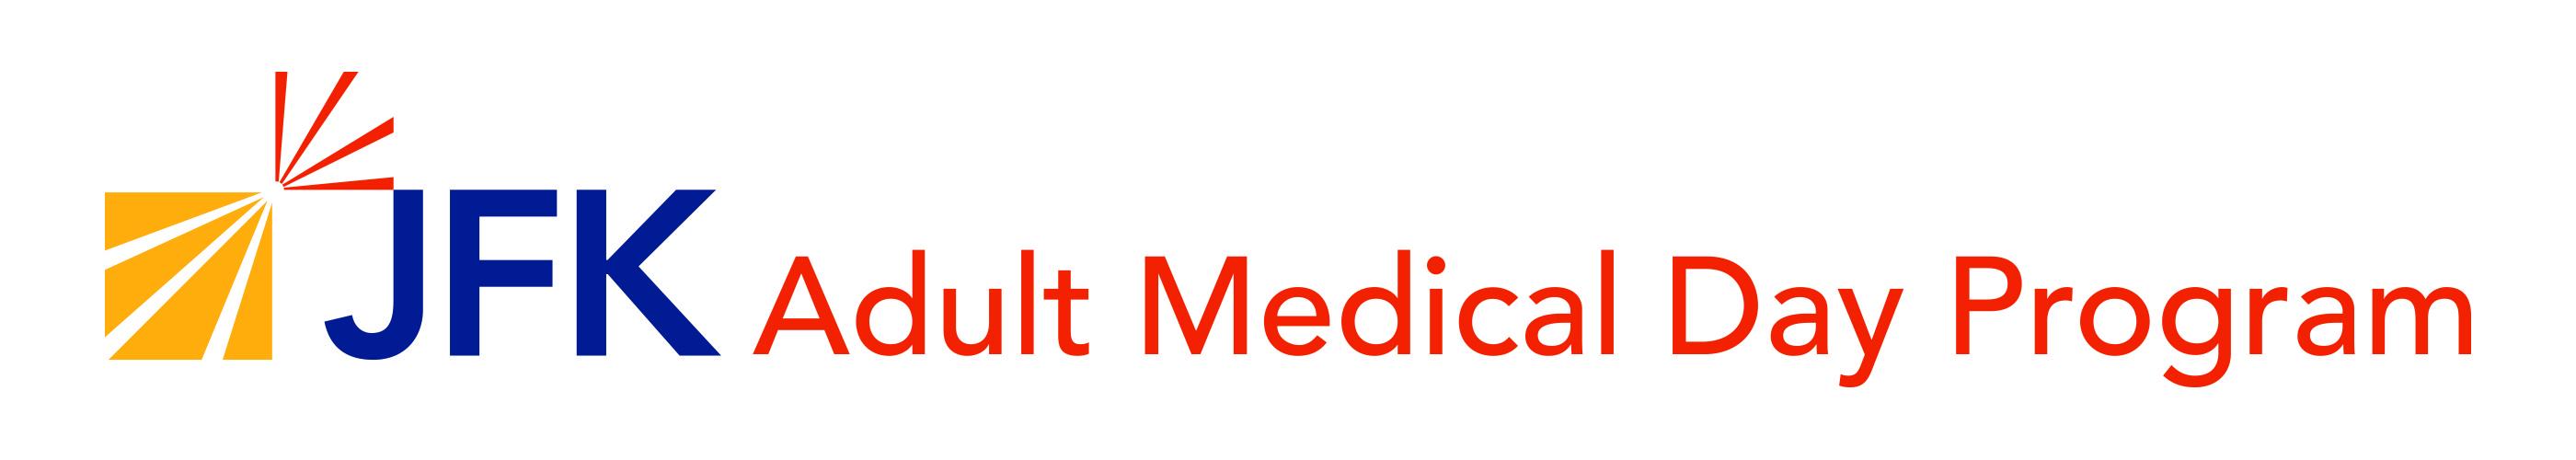 74fa24bbec04eae2c39c_JFK_Adult_Medical.jpg